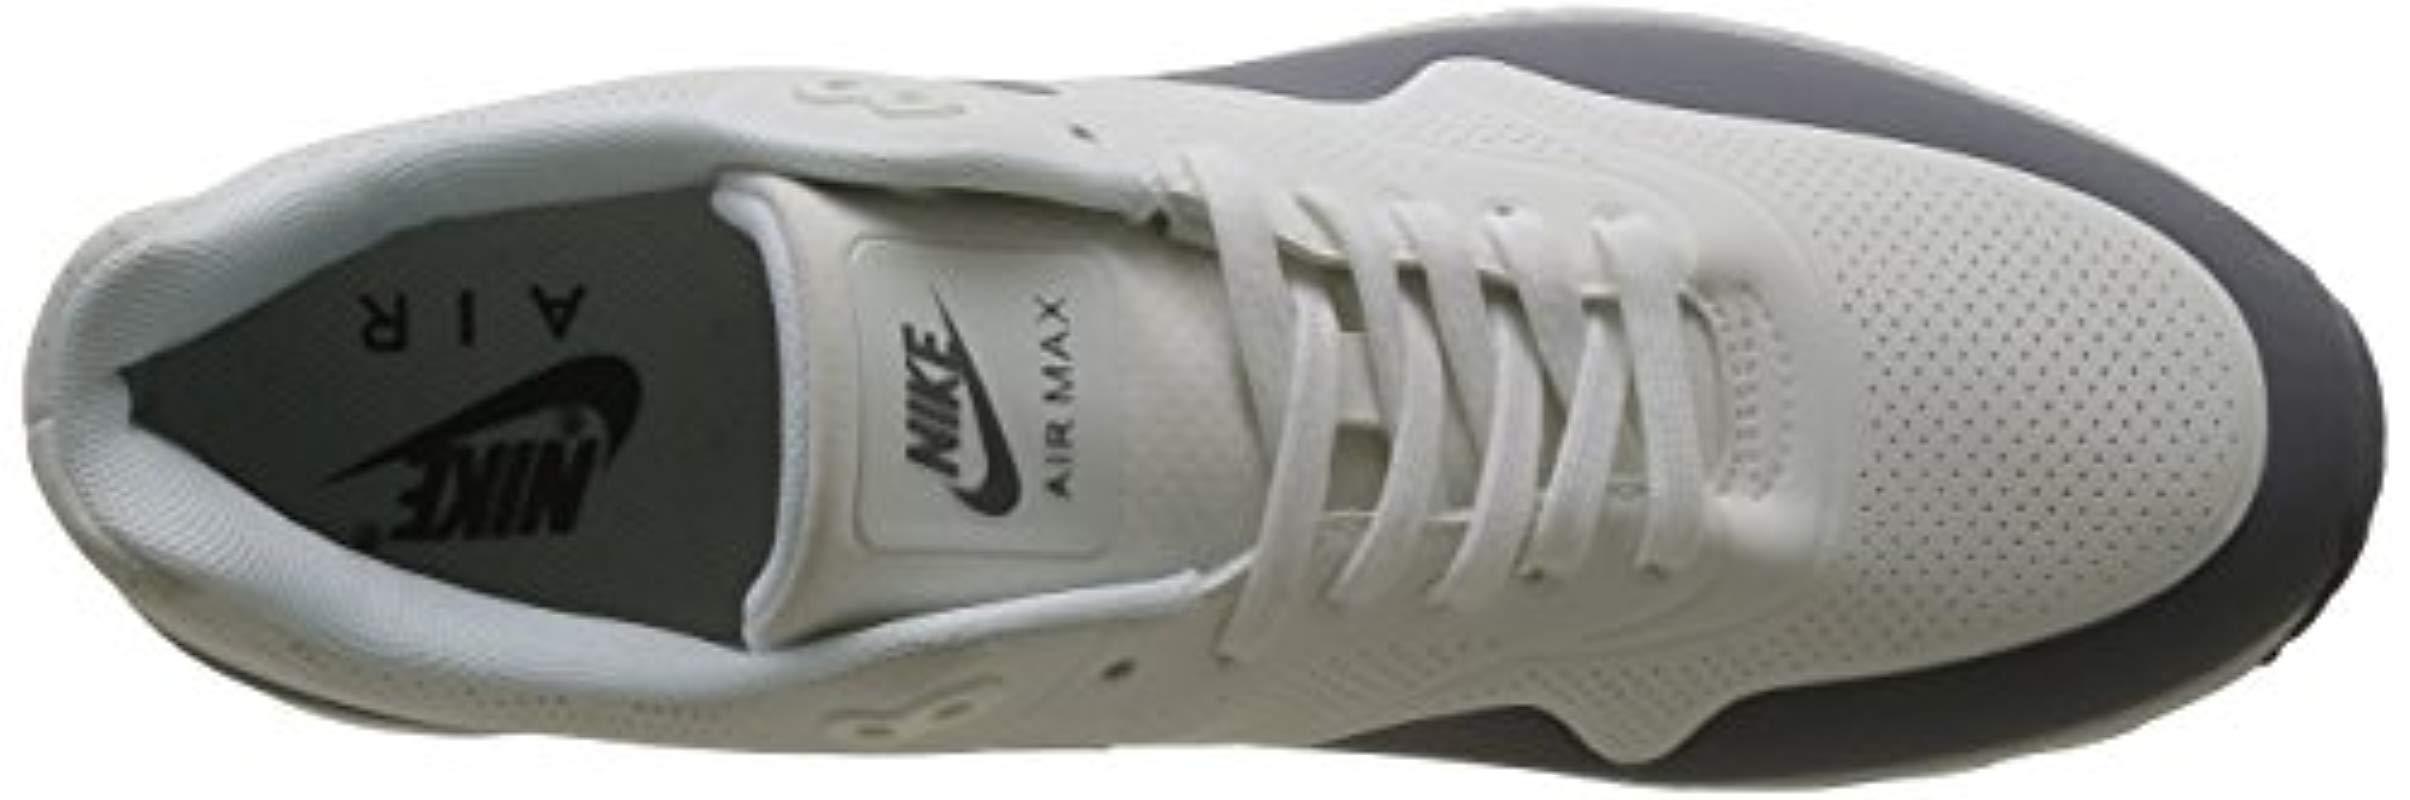 new styles e07e8 93c8e Nike - Gray Air Max 1 Ultra Moire Training Running Shoes - Lyst. View  fullscreen